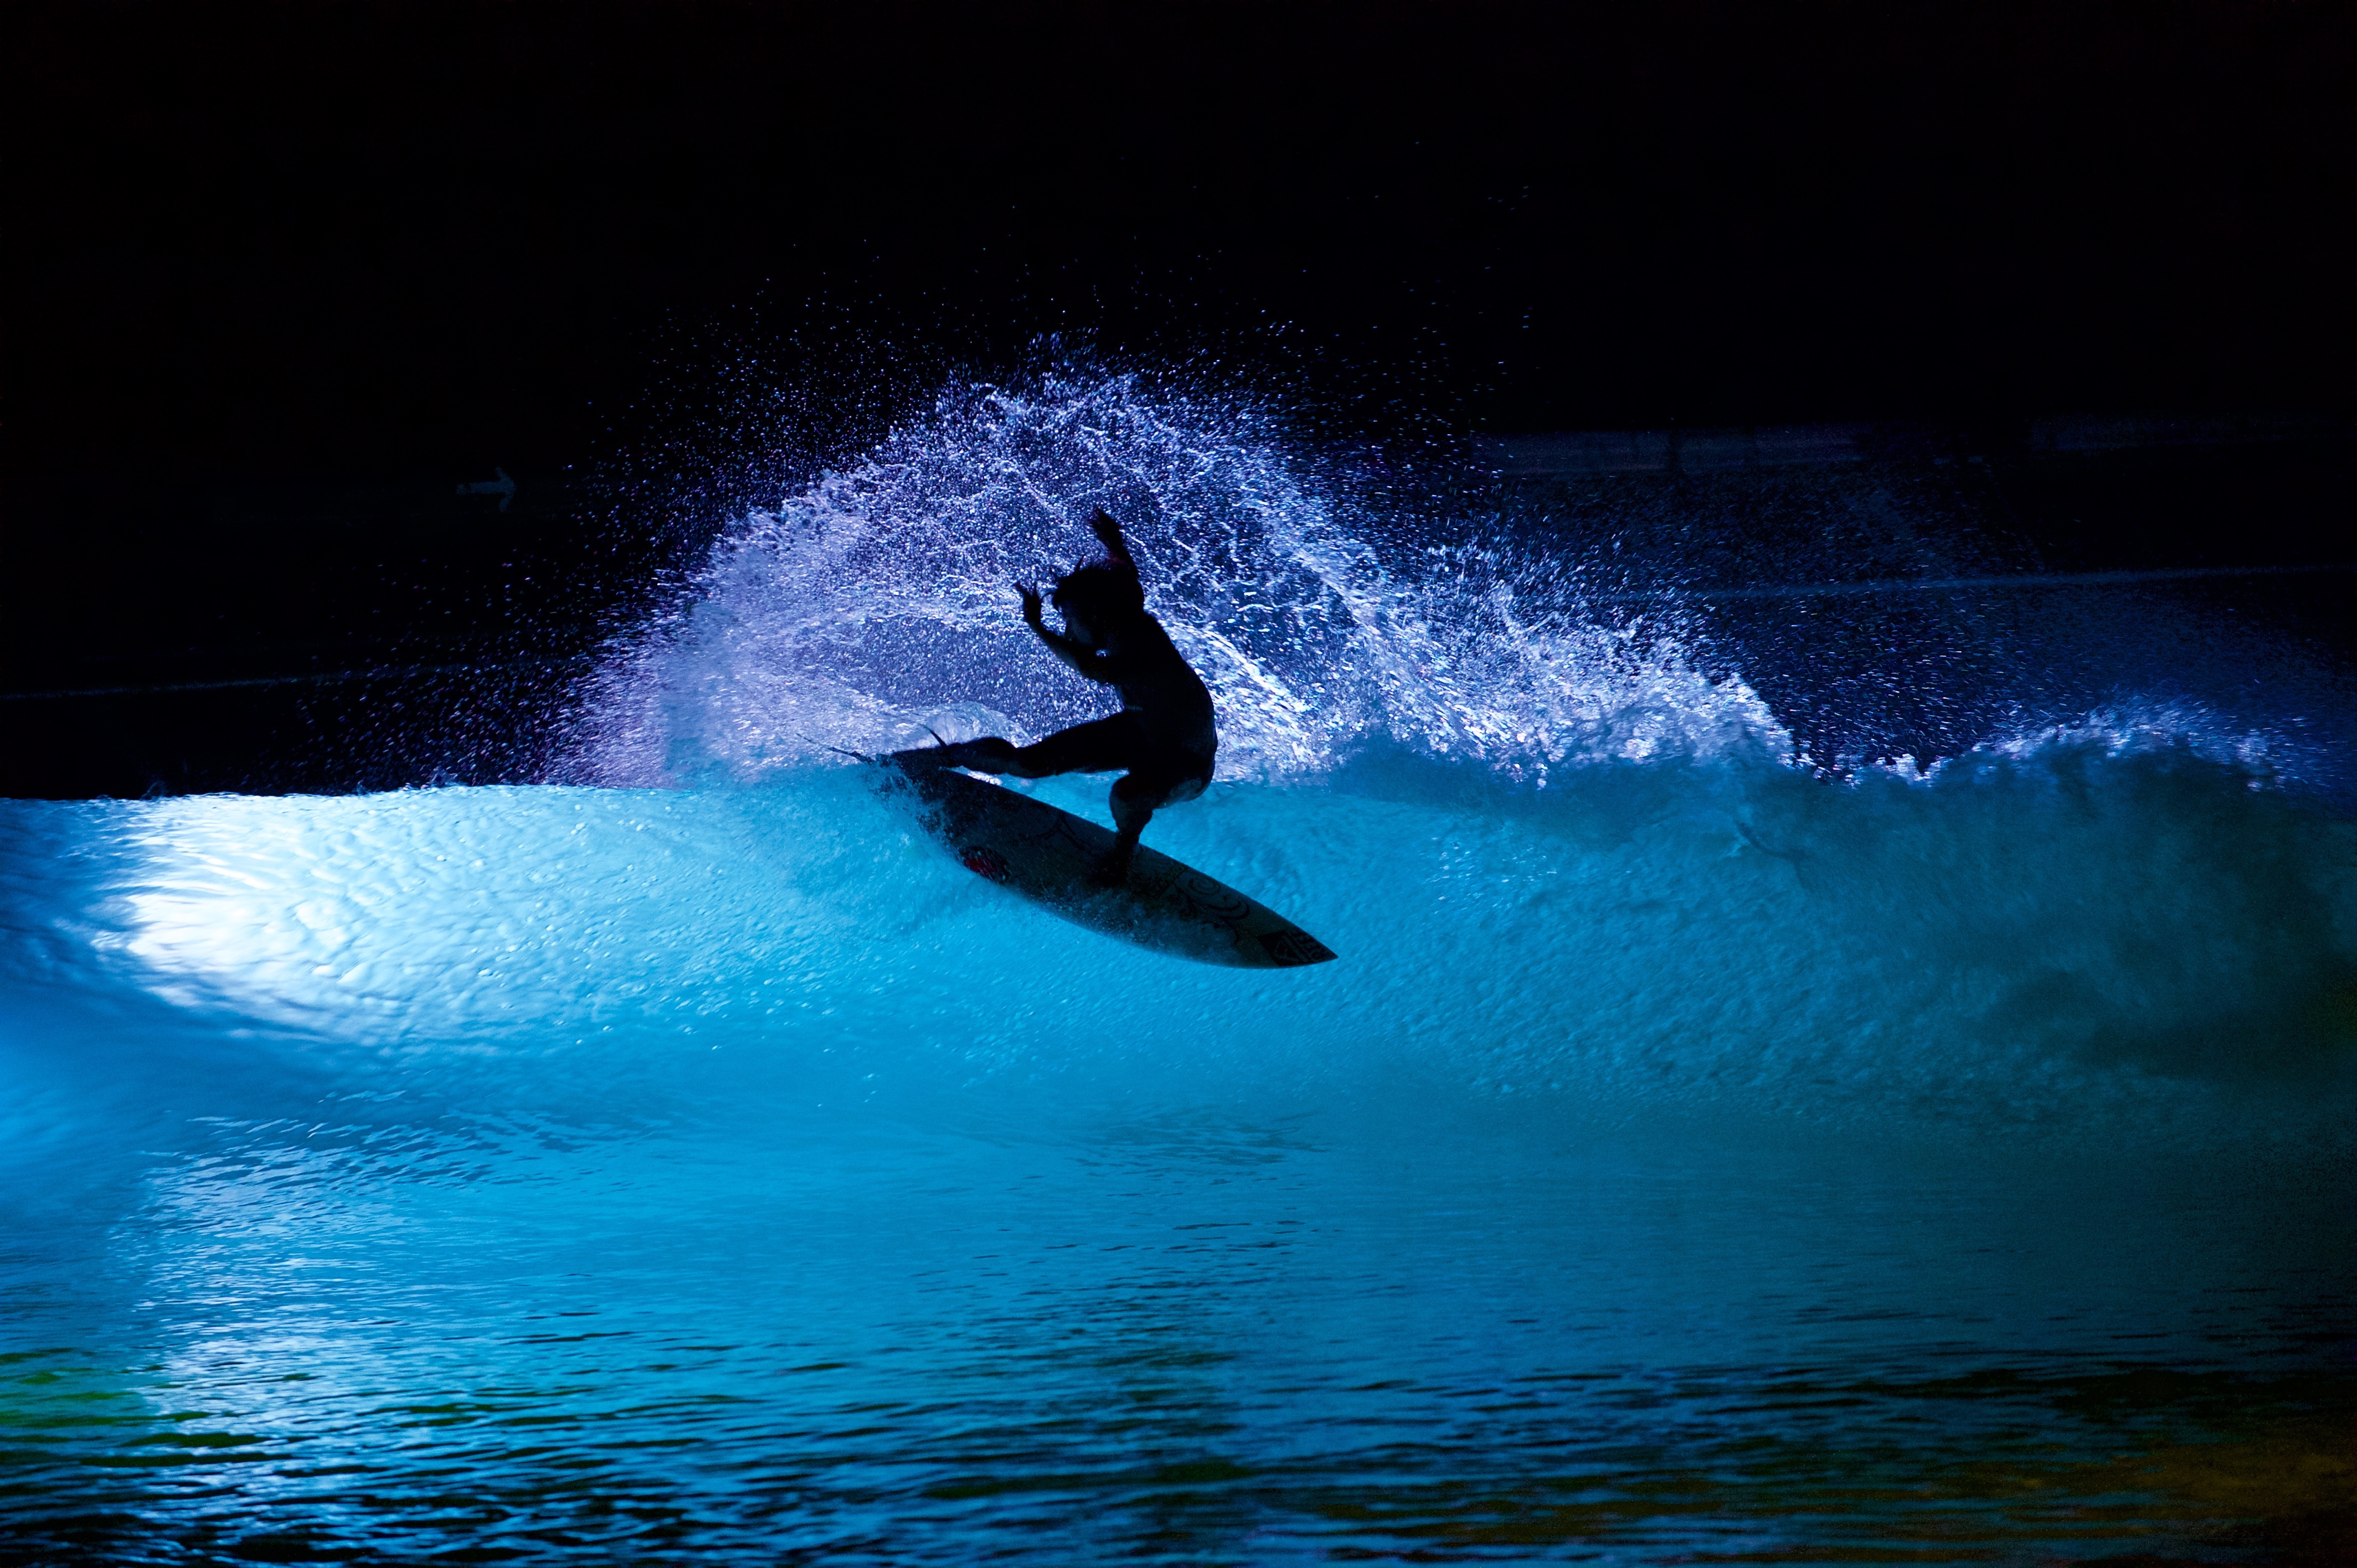 Wavegarden Night Surfing Wavelength Europe S Longest